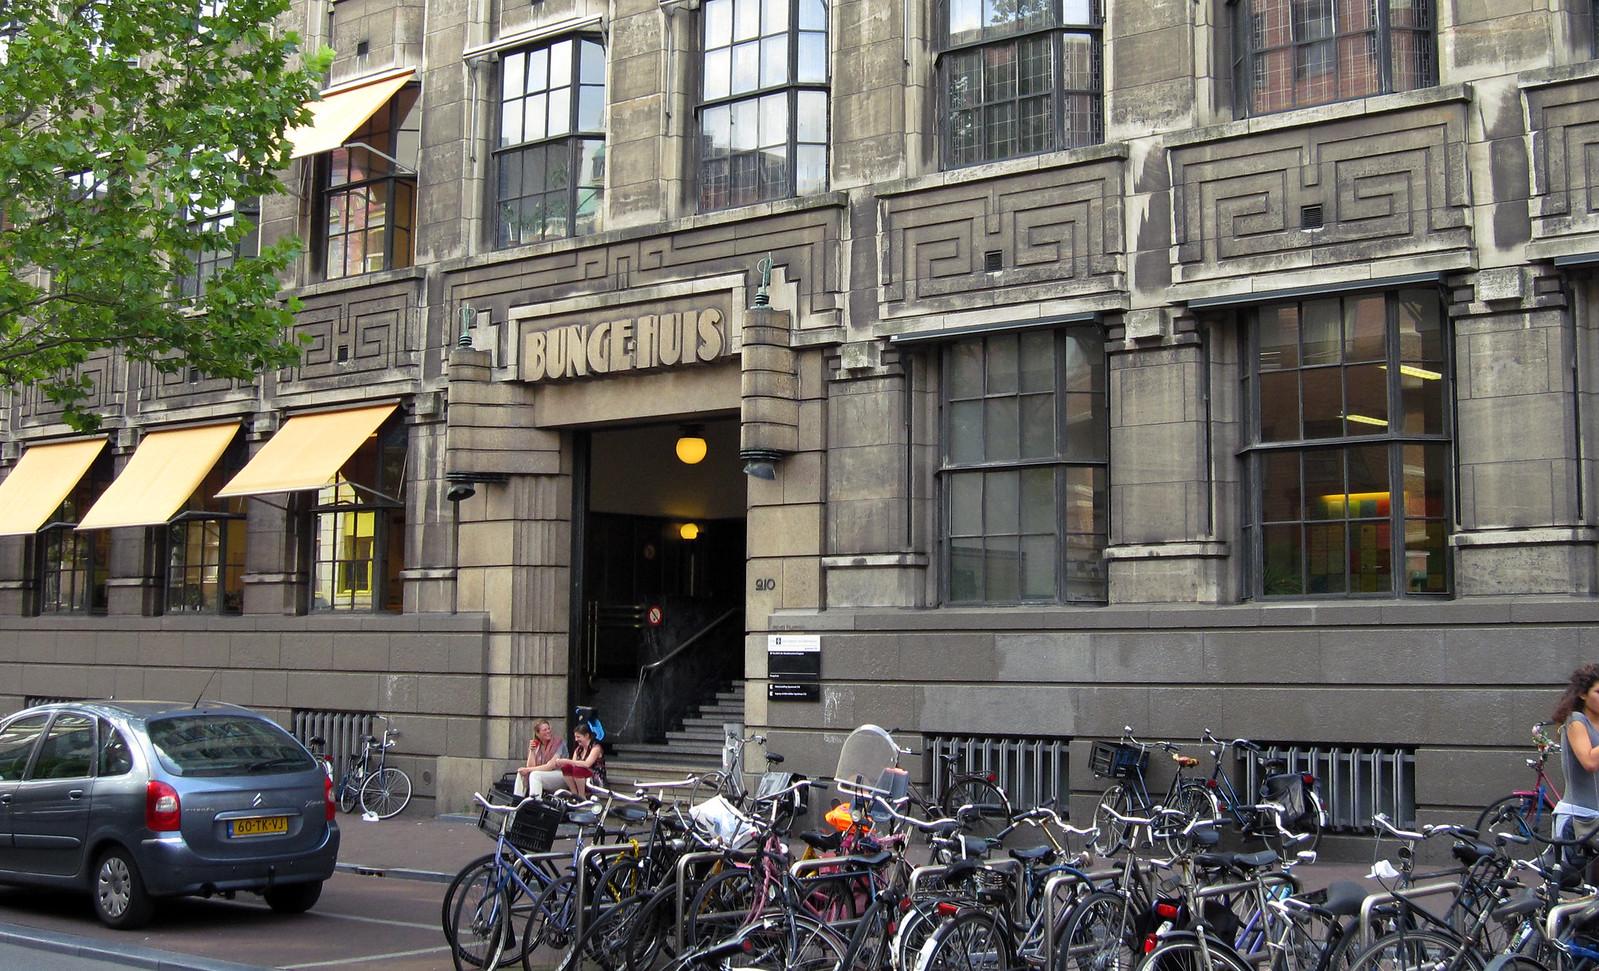 Amsterdam 321 BUNGEHUIS